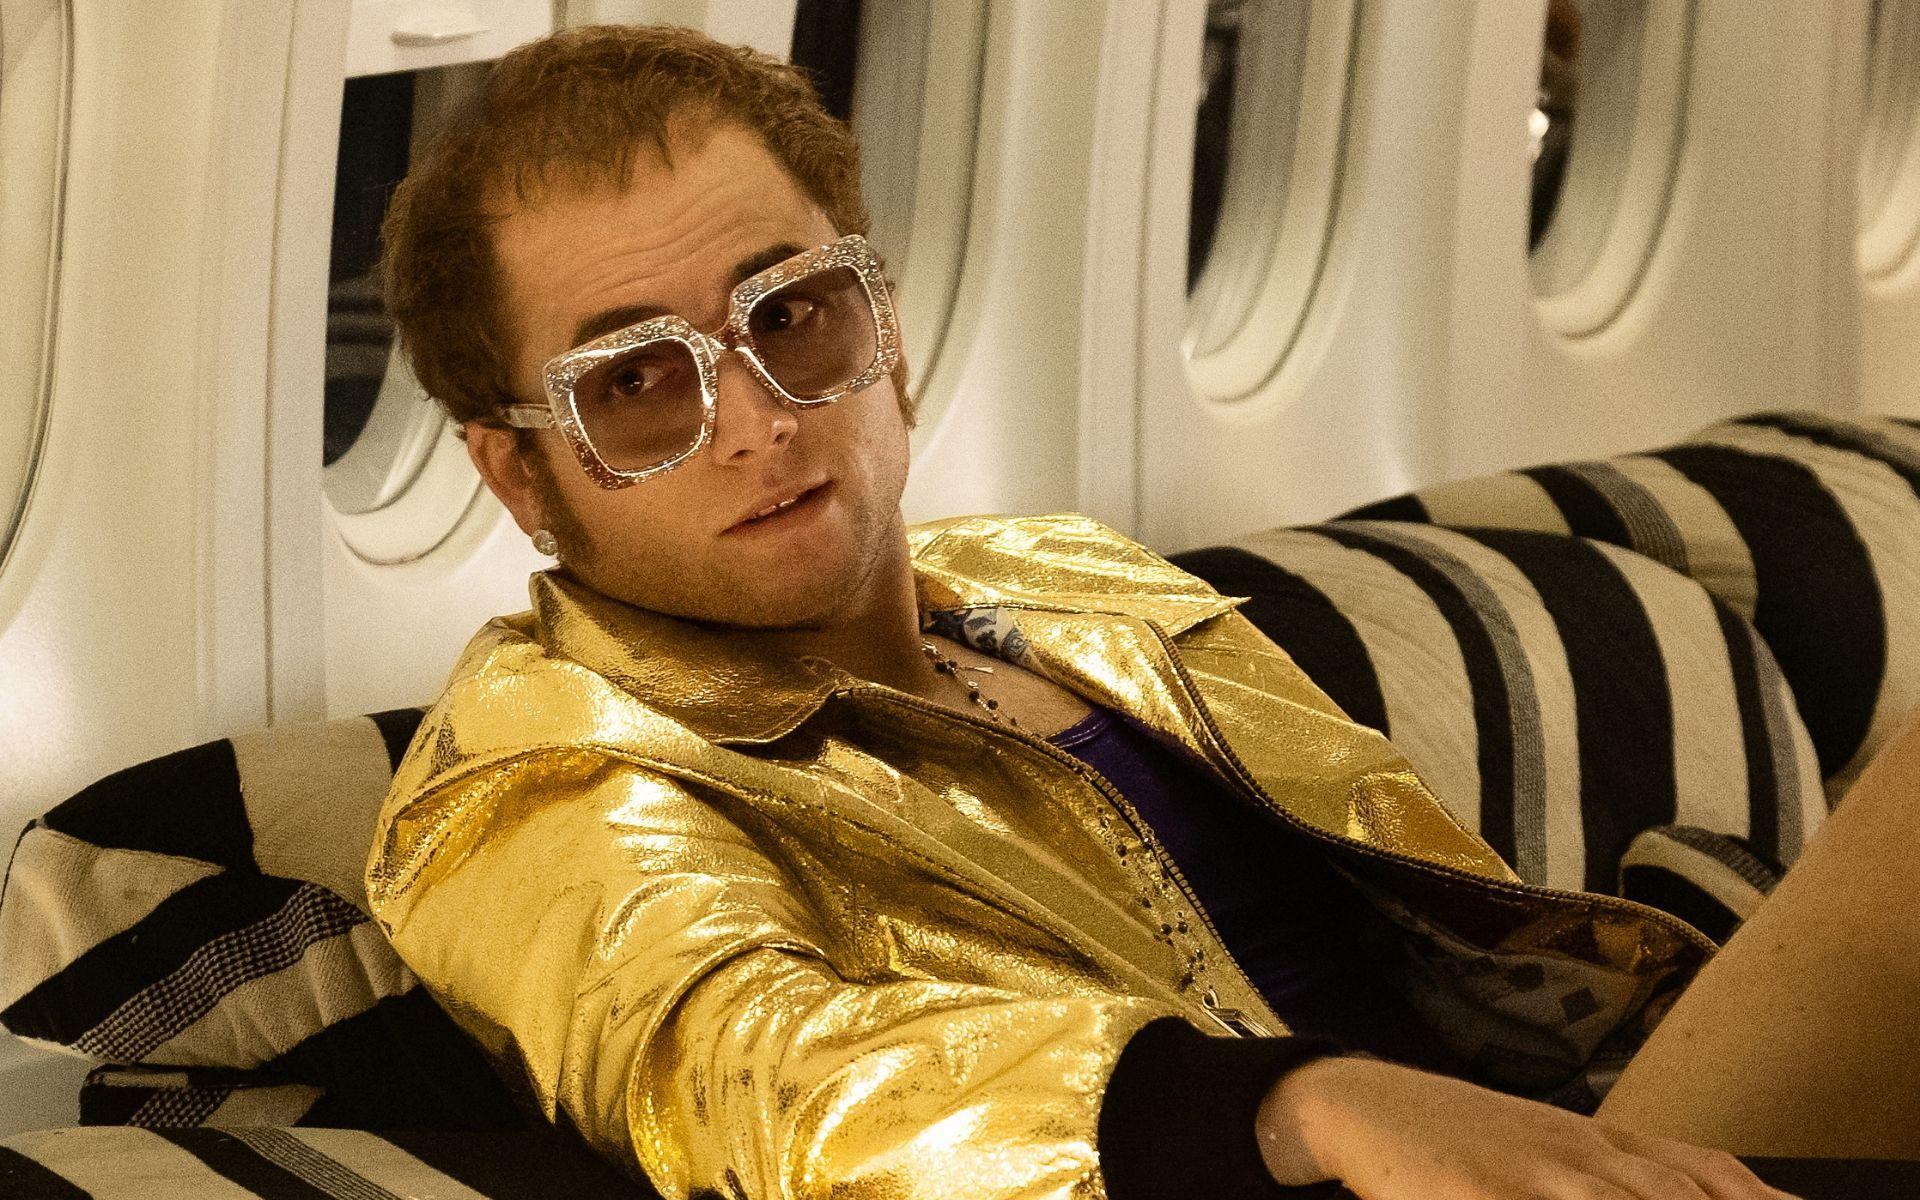 Chopard Helped Transform Taron Egerton Into Elton John In Rocketman